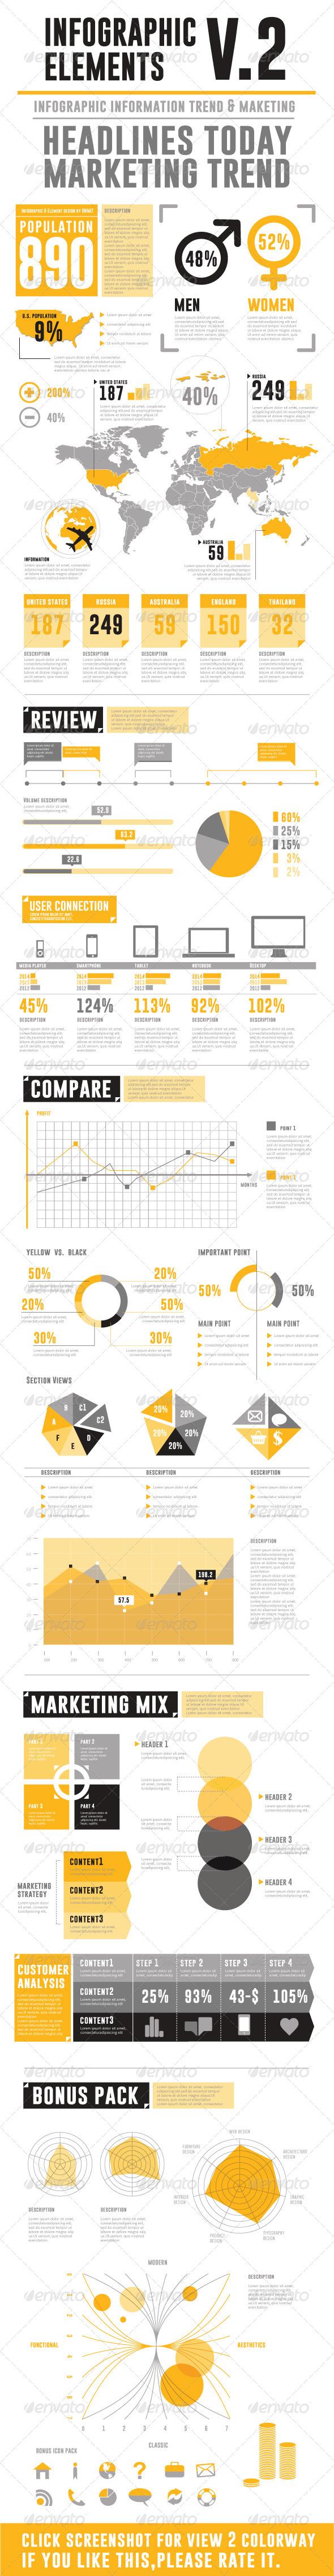 Infographic Elements V.2 - Infographics